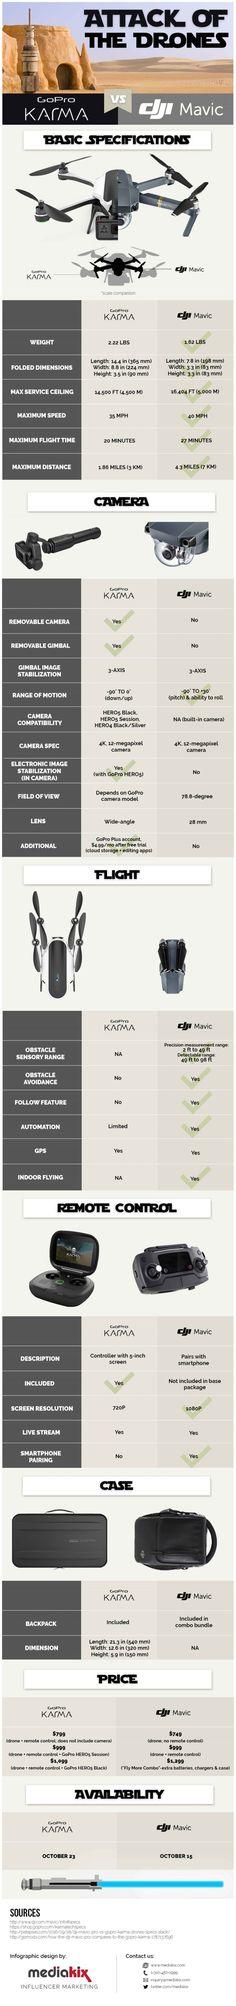 drones-dji-mavic-gopro-karma-comparison